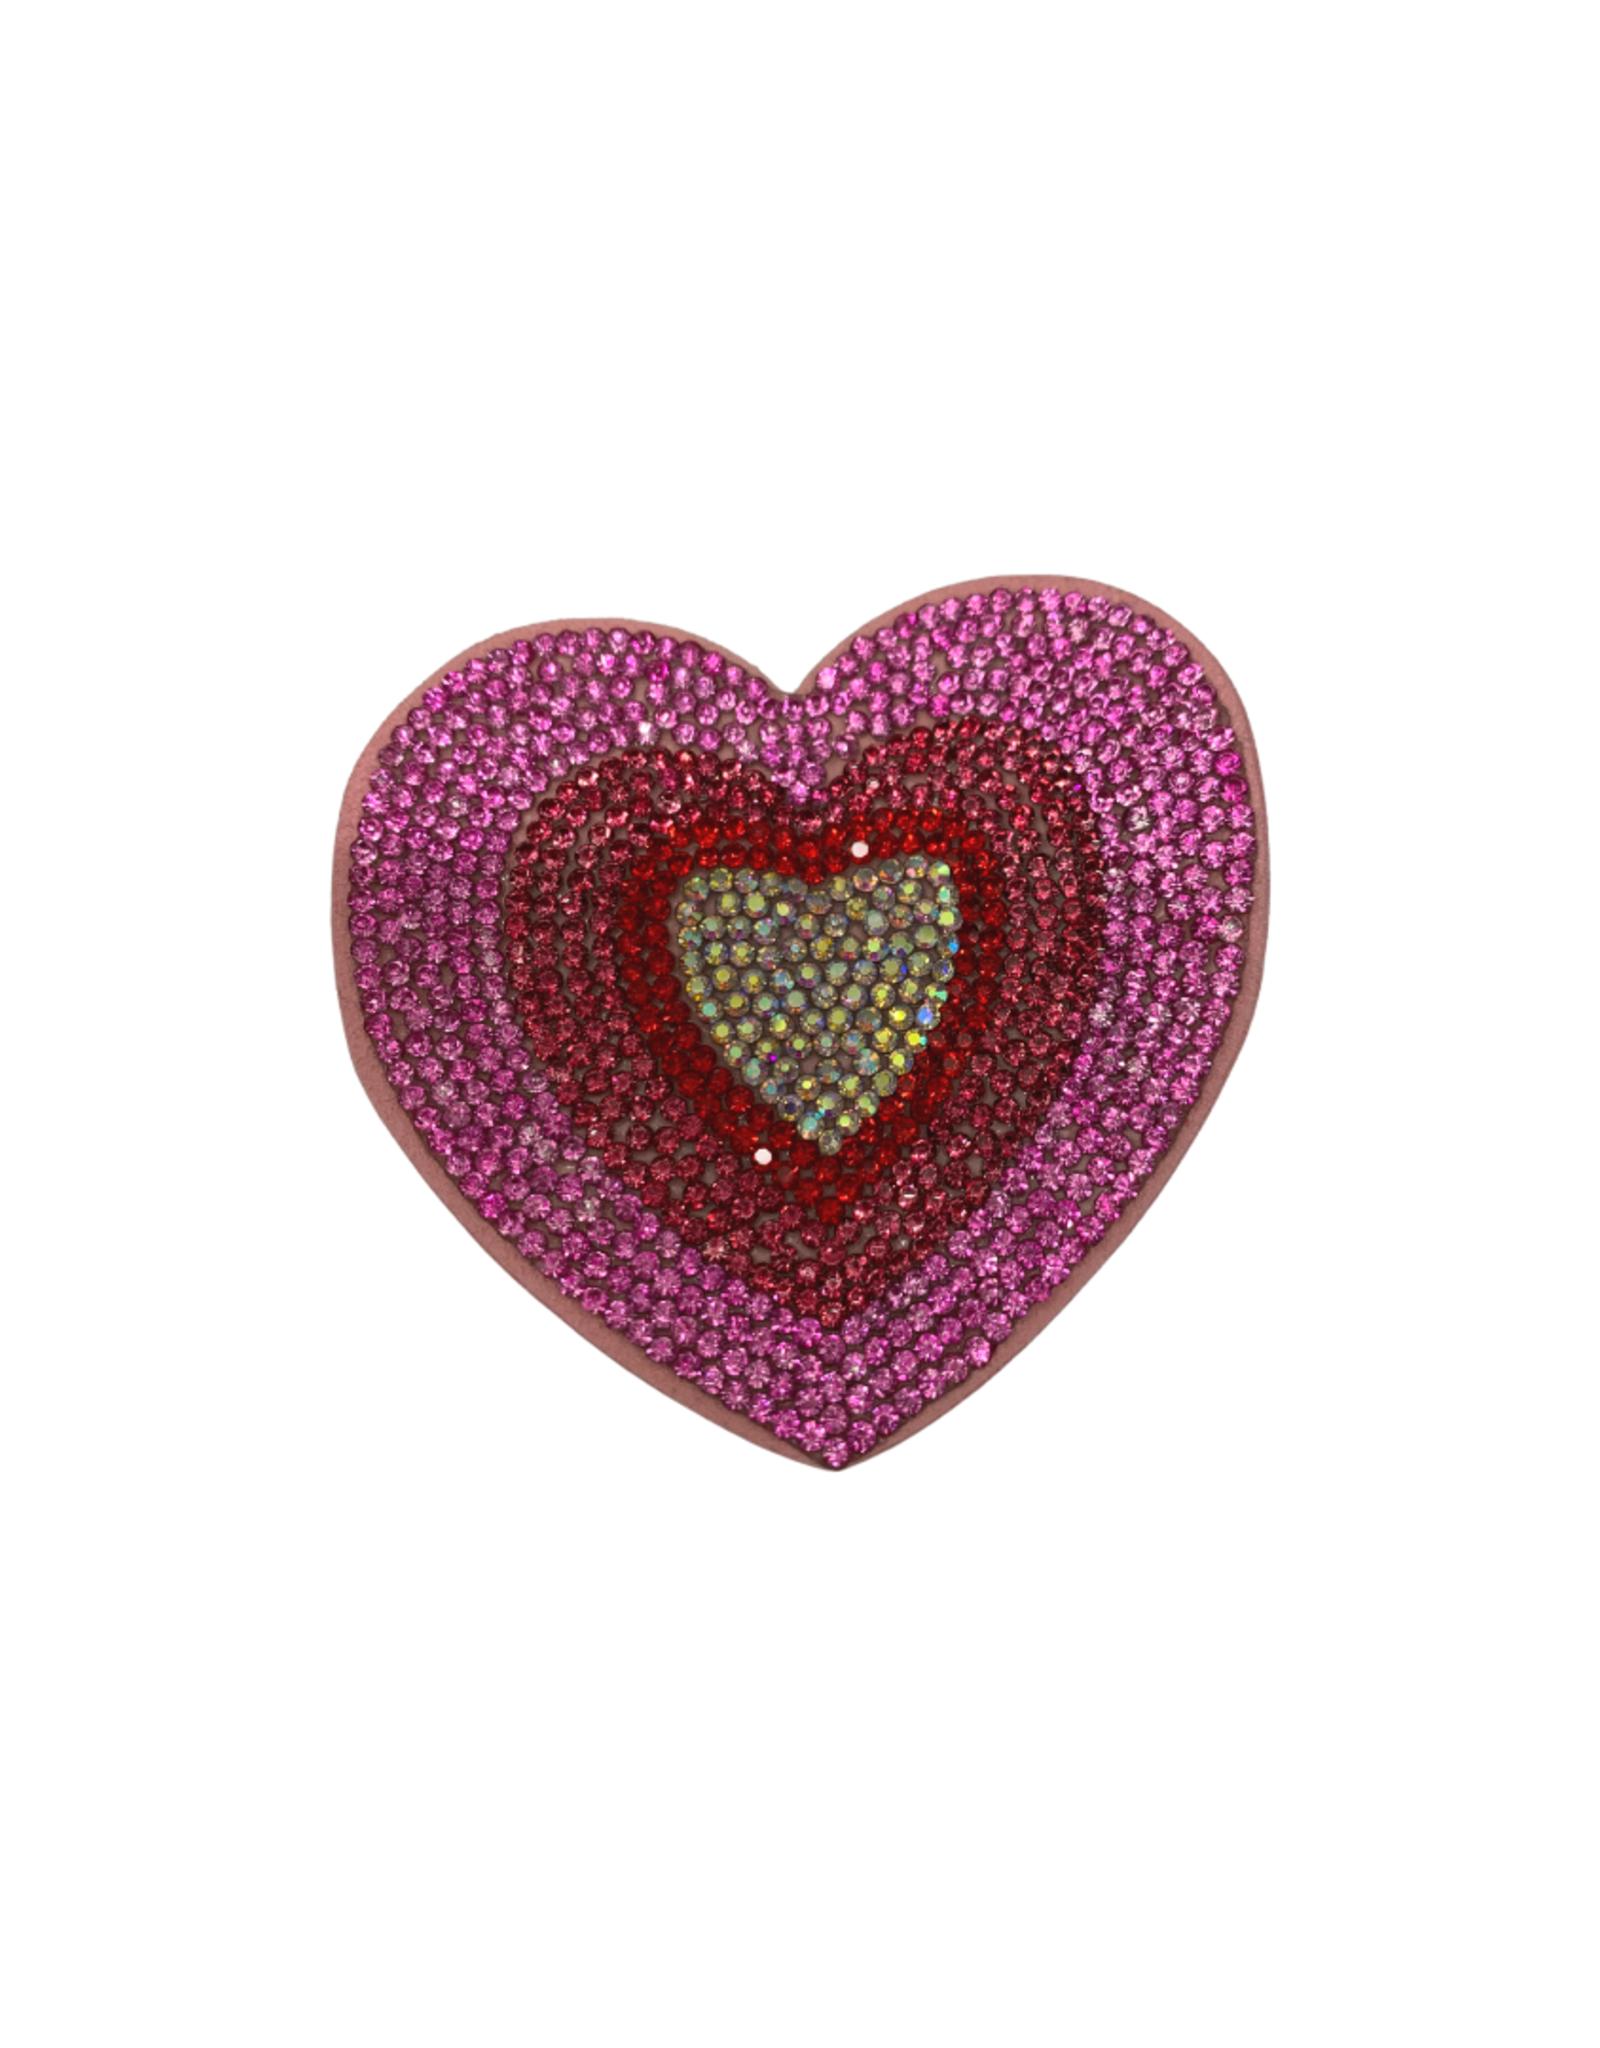 Bows Arts Rhinestone Motif Clip - Multi Heart